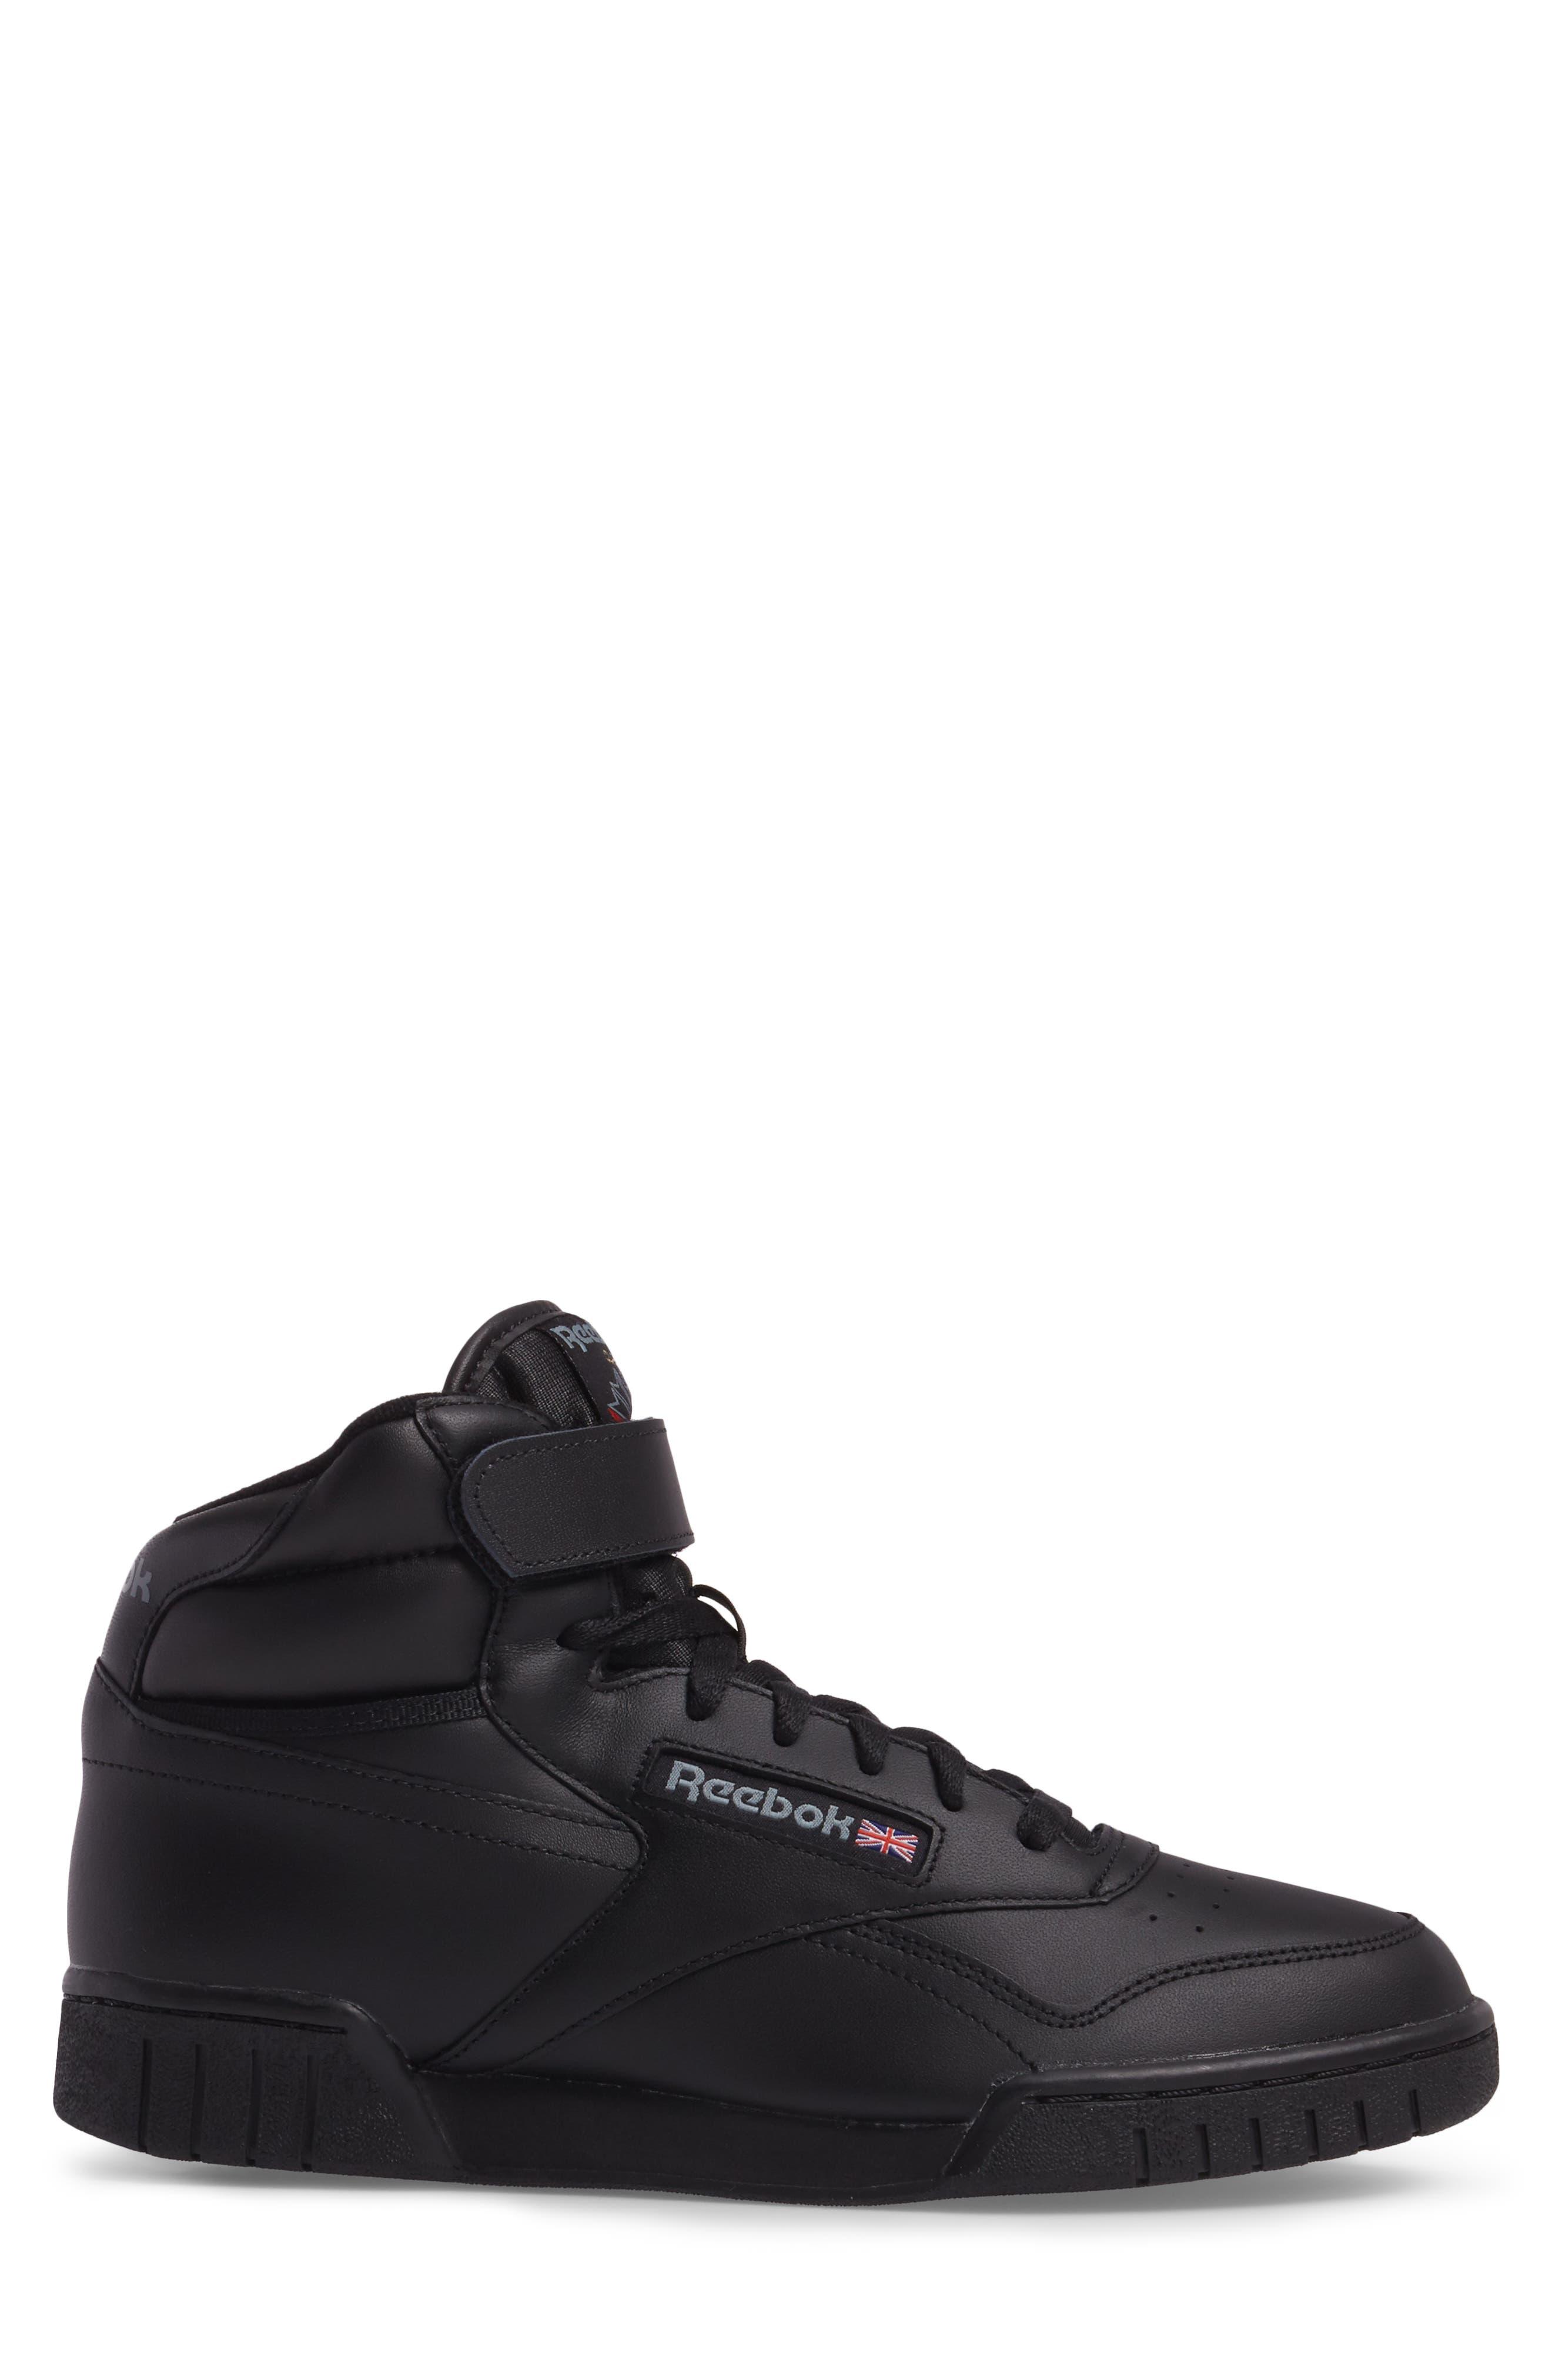 Ex-O-Fit Hi Sneaker,                             Alternate thumbnail 3, color,                             Black